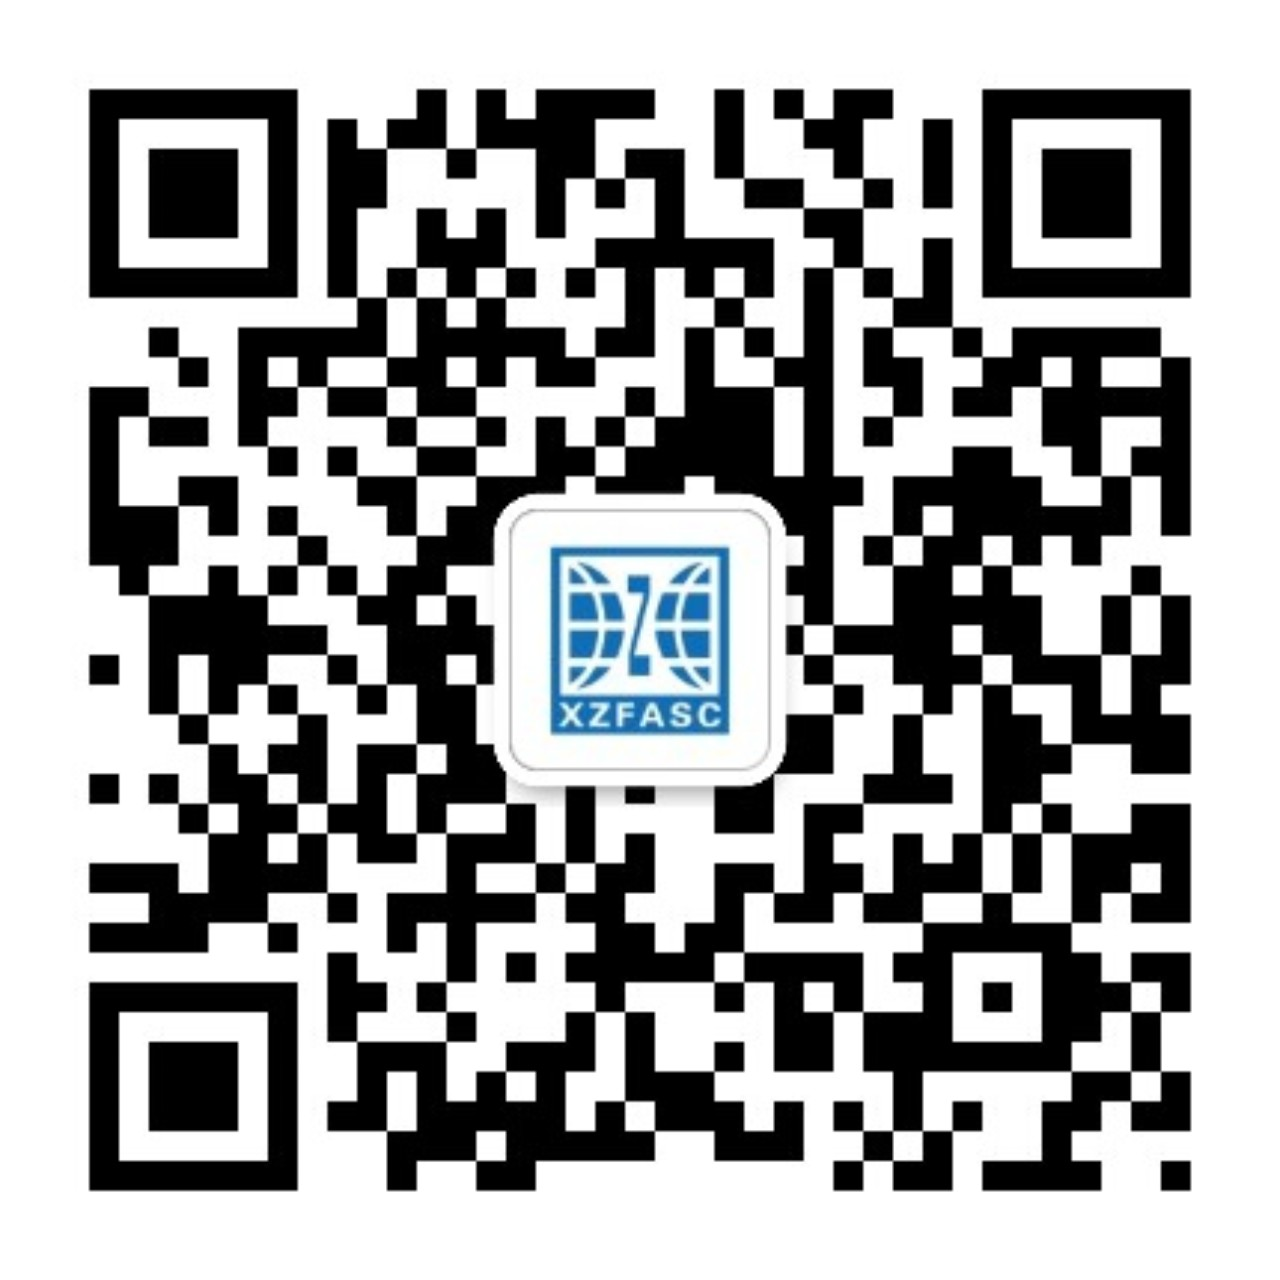 qrcode_for_徐州外服资源平台_1280.jpg